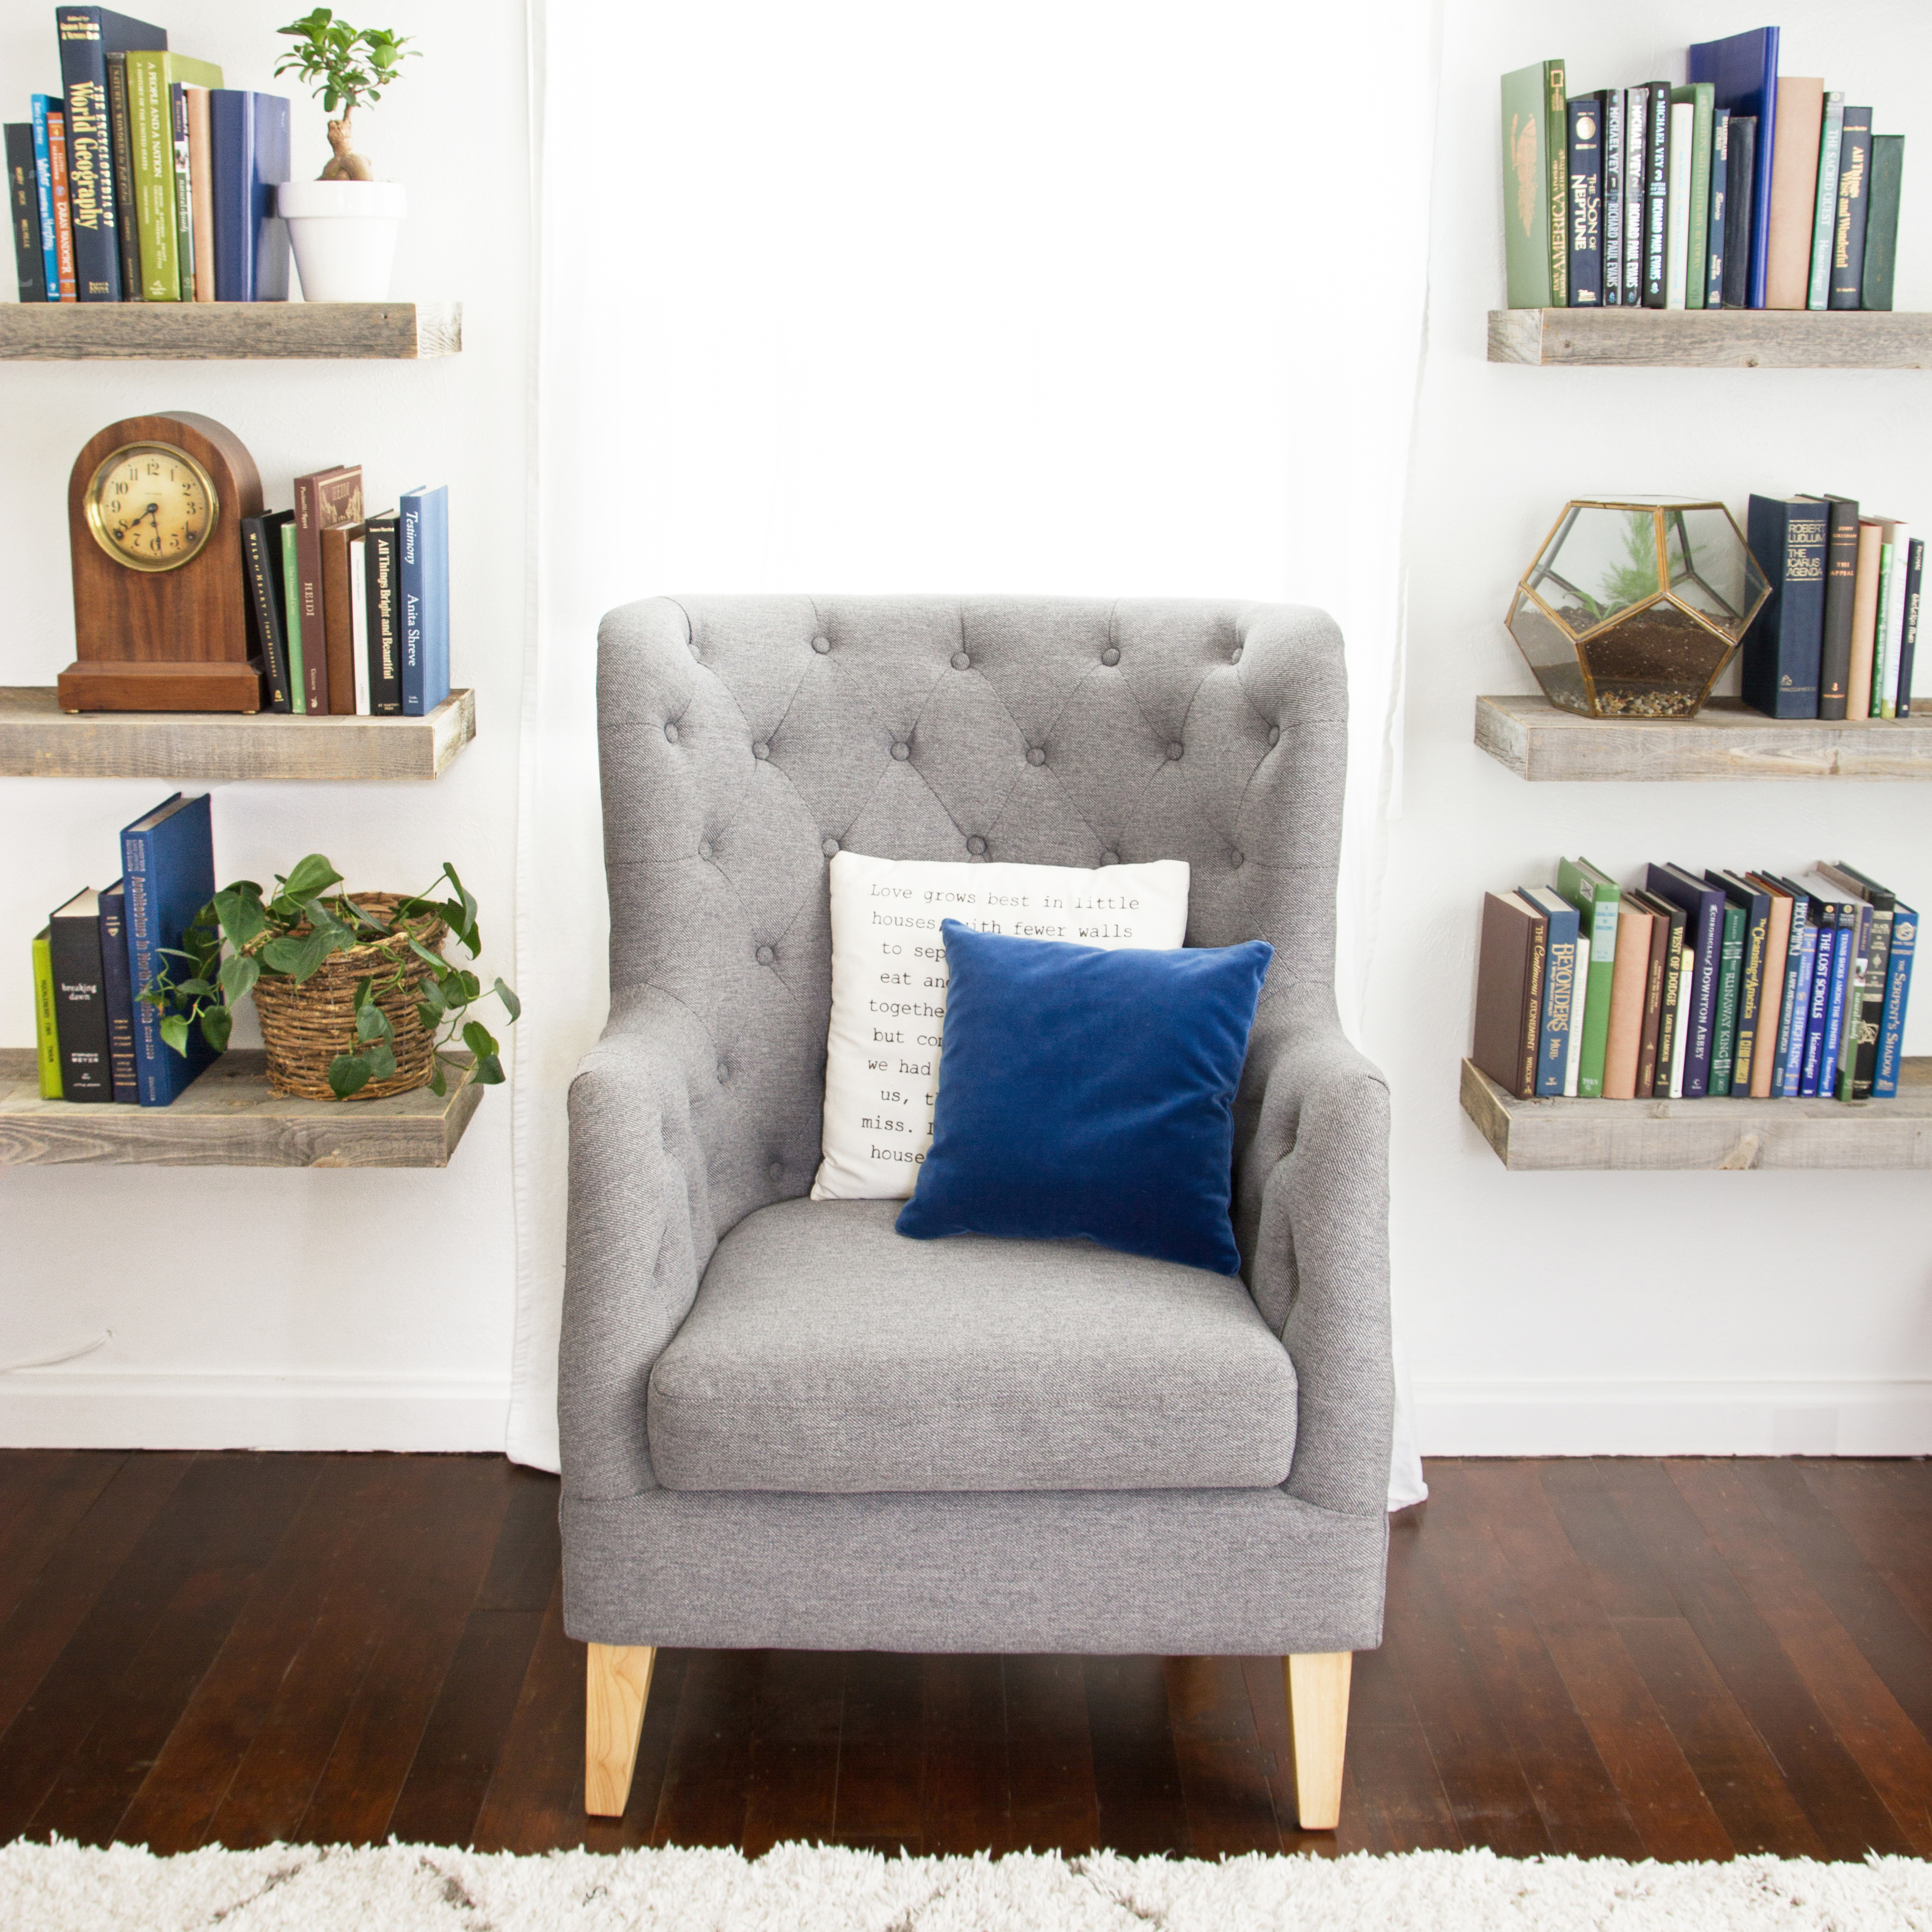 Ikea Hack Using Reclaimed Wood Stacy Risenmay